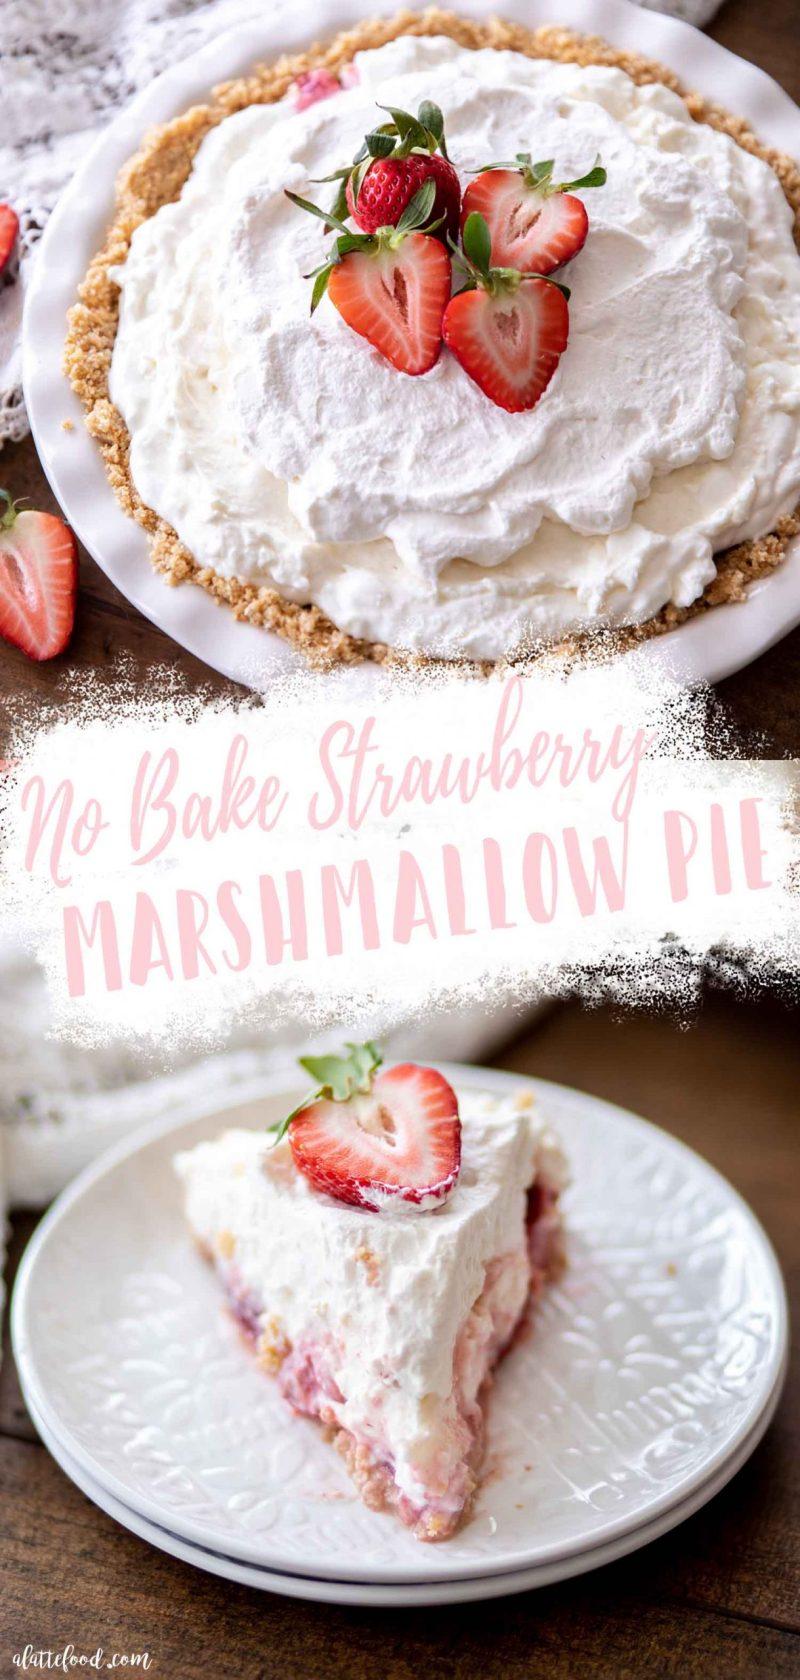 No bake strawberry marshmallow pie collage